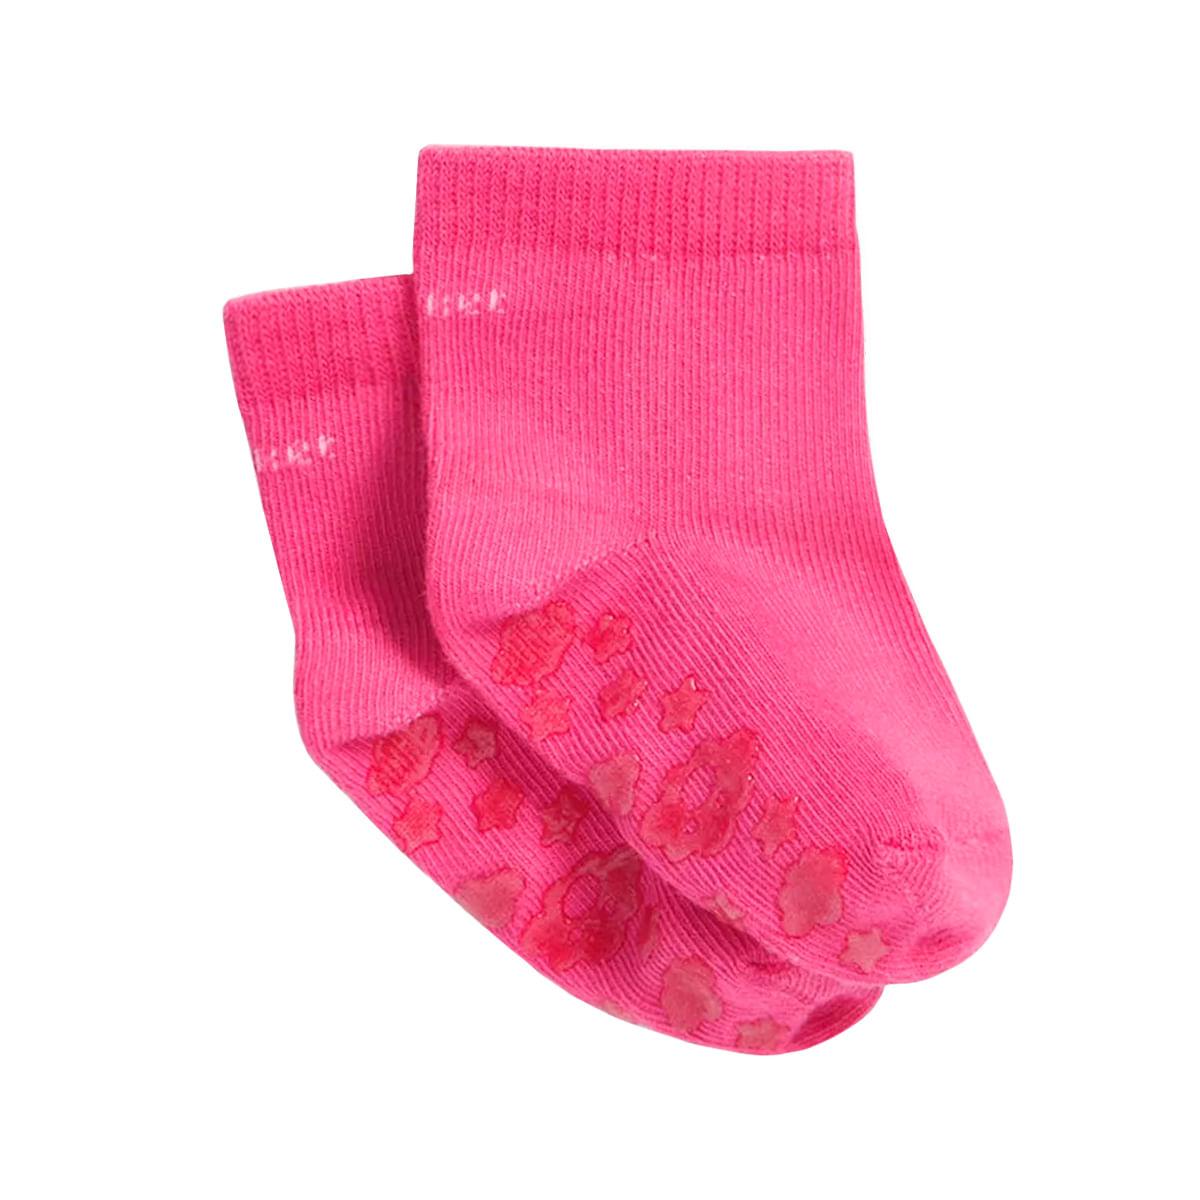 a8f8cb787 Meia Soquete Antiderrapante Pink Puket no Bebefacil